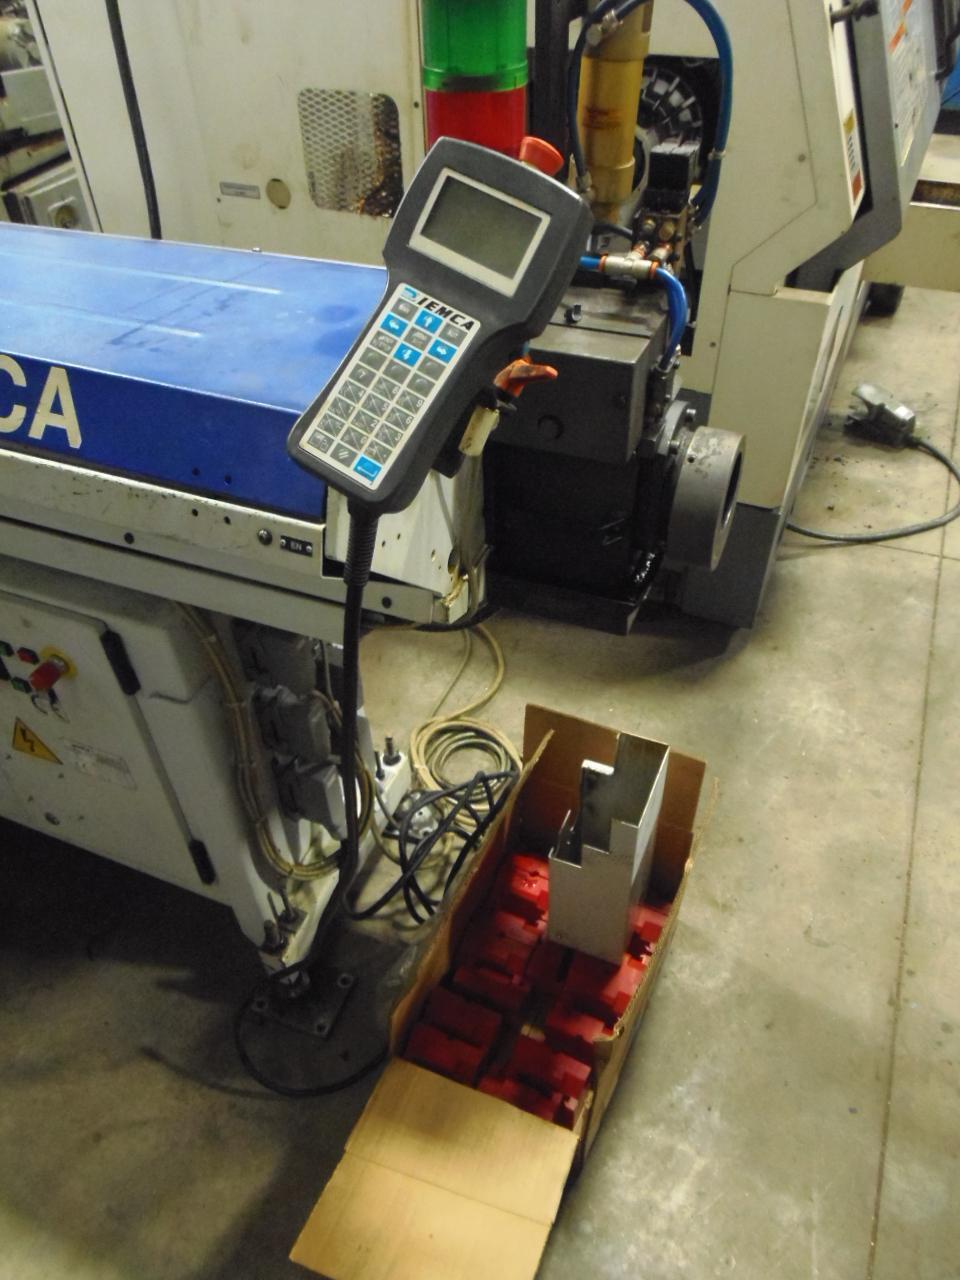 MAZAK QTN-200 CNC LATHE, 24 x 26, FUSION 640T CONTROL, IEMCA BOSS 547/37 BARFEED, 2003